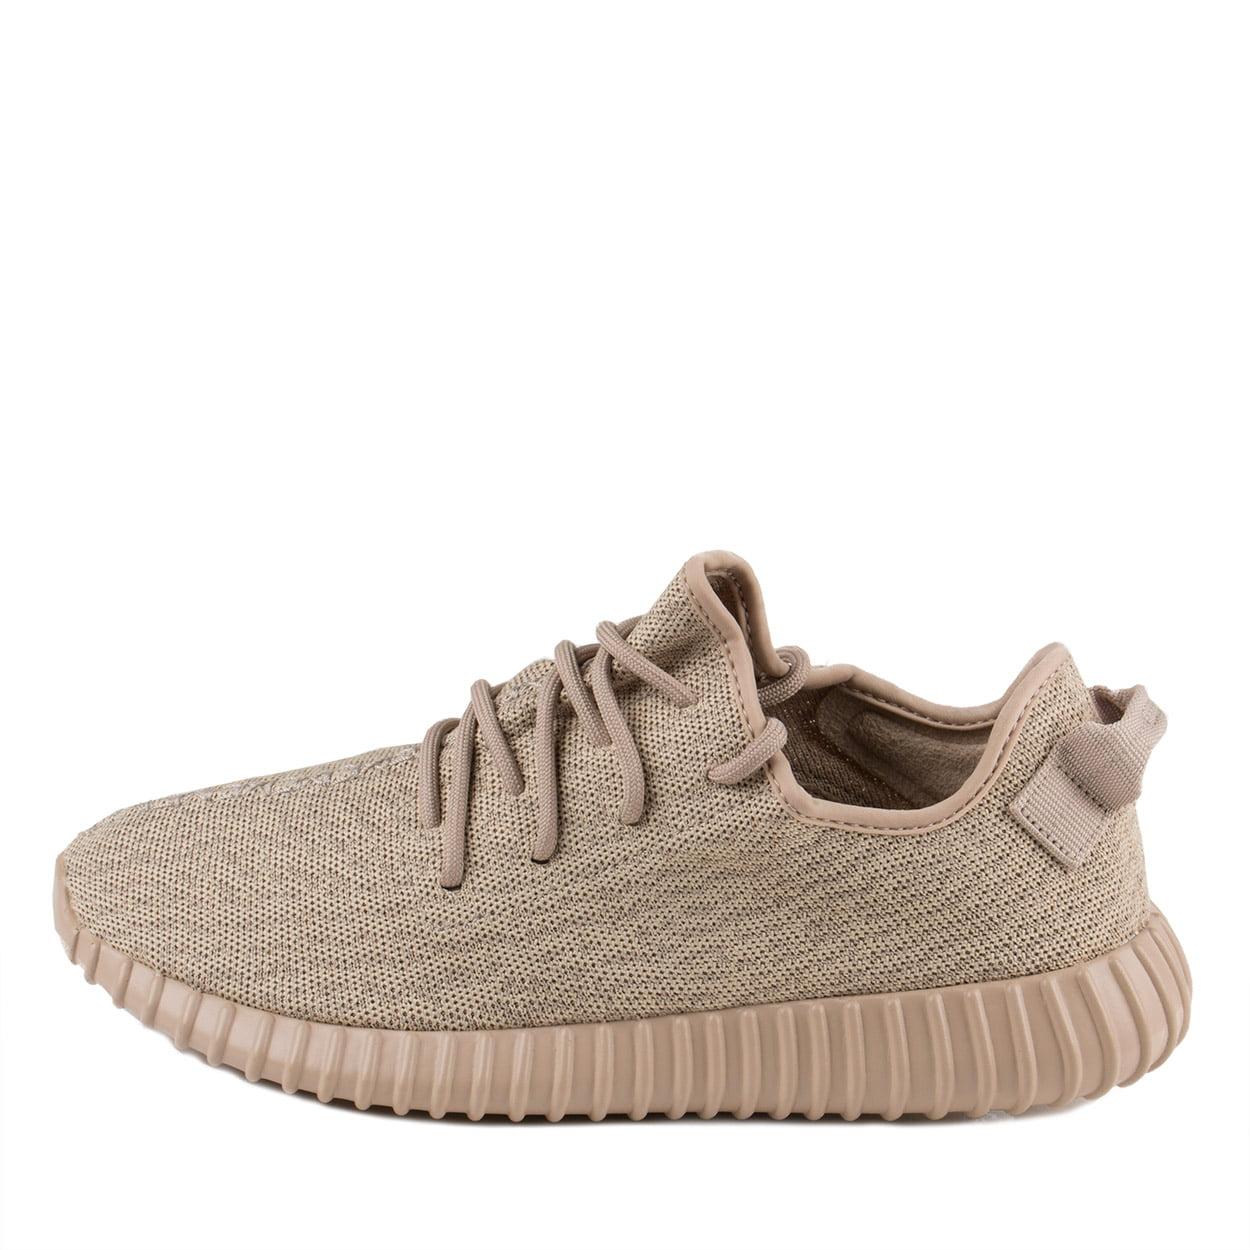 Amazon.com Cheap Adidas Originals Mens Primeknit NMD_R1 Running